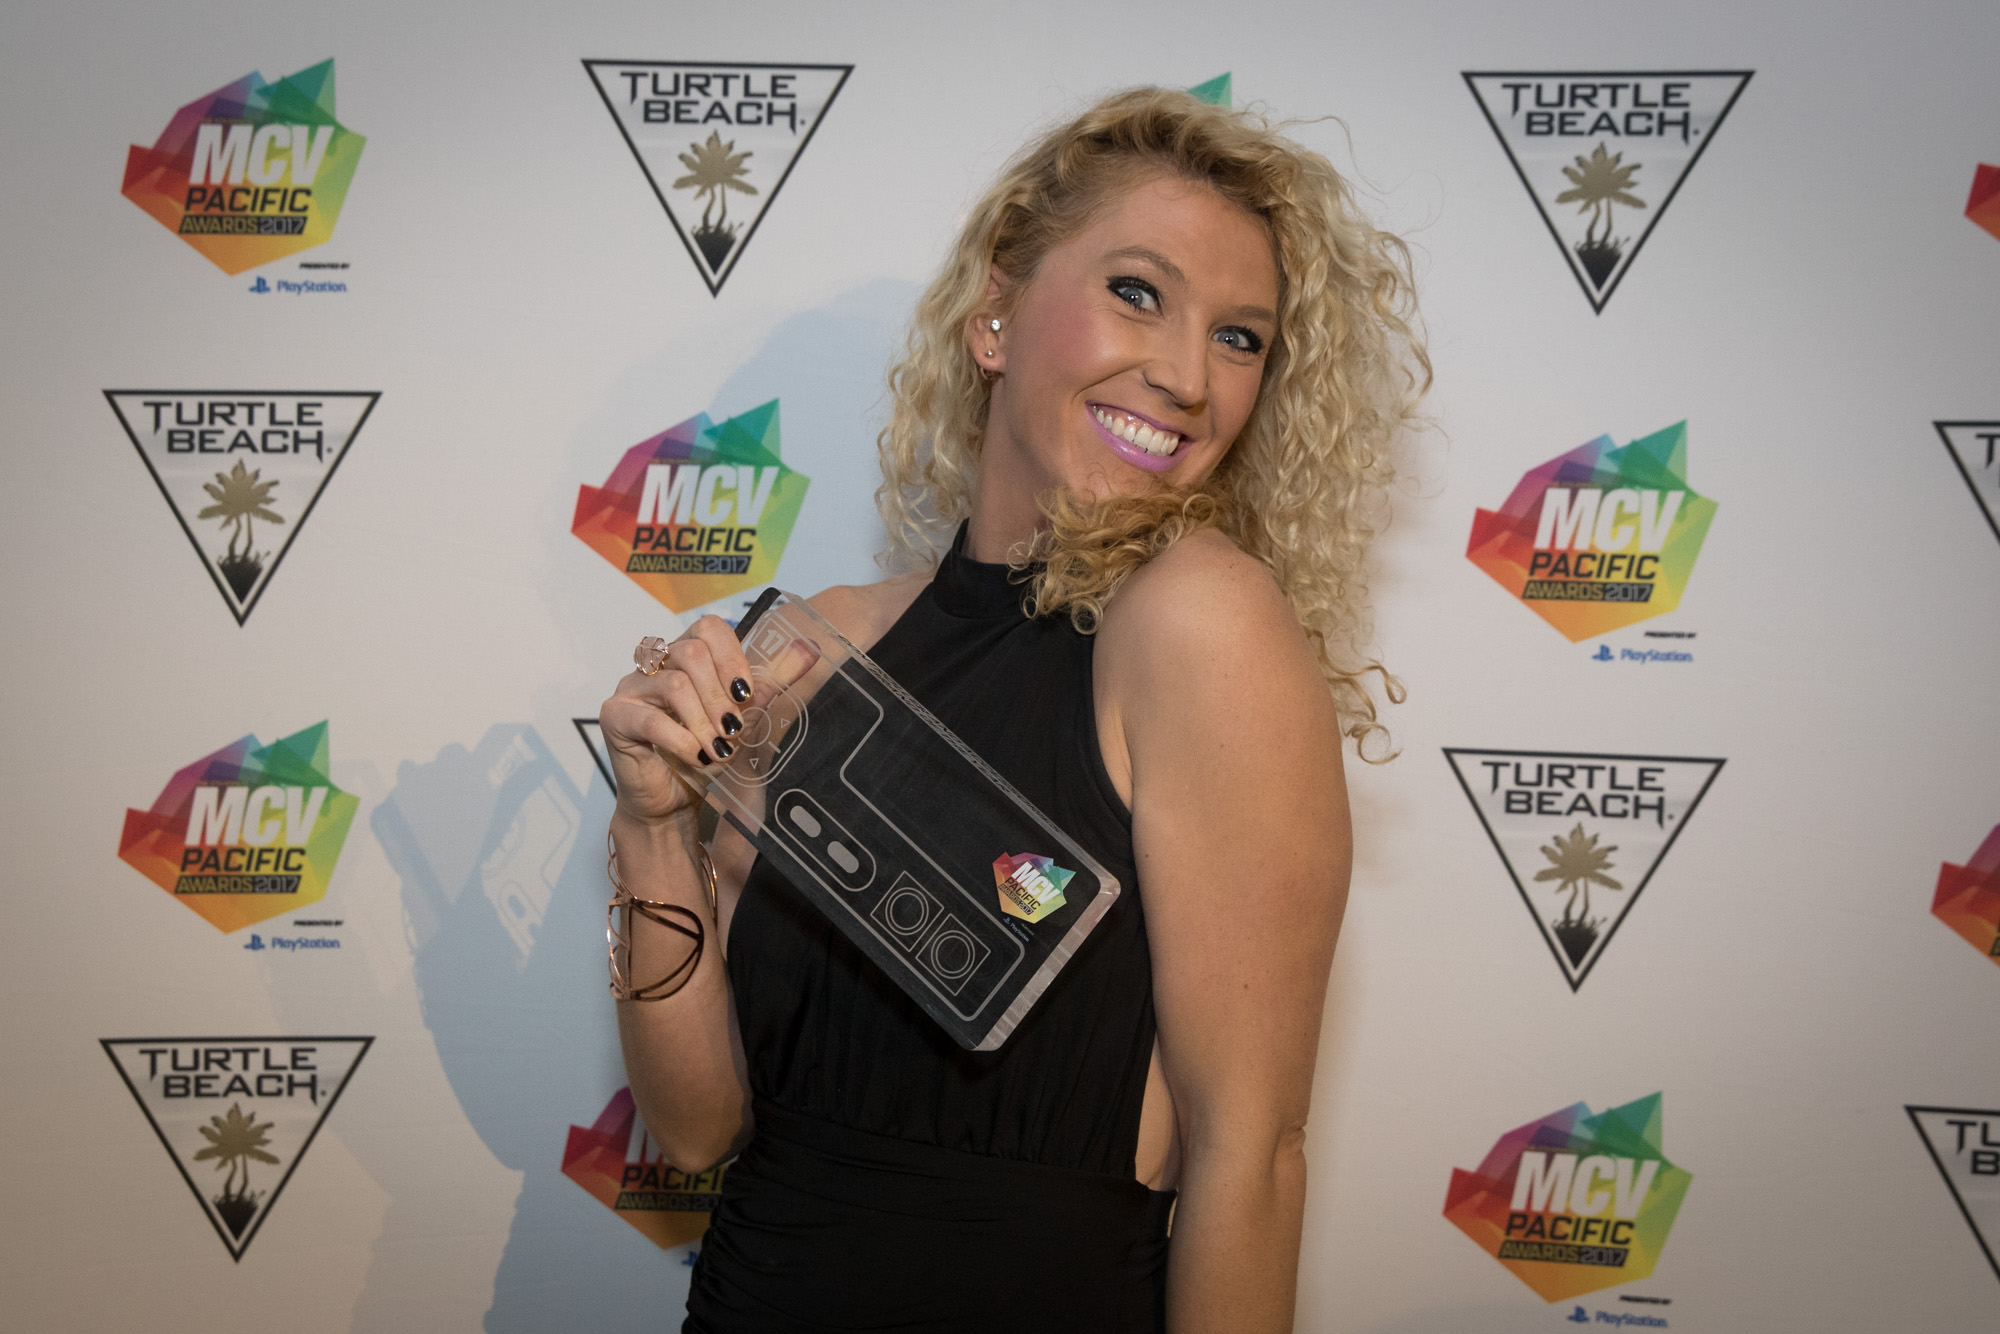 MCV_Pacific_Awards_1_June_17_PS_086.jpg